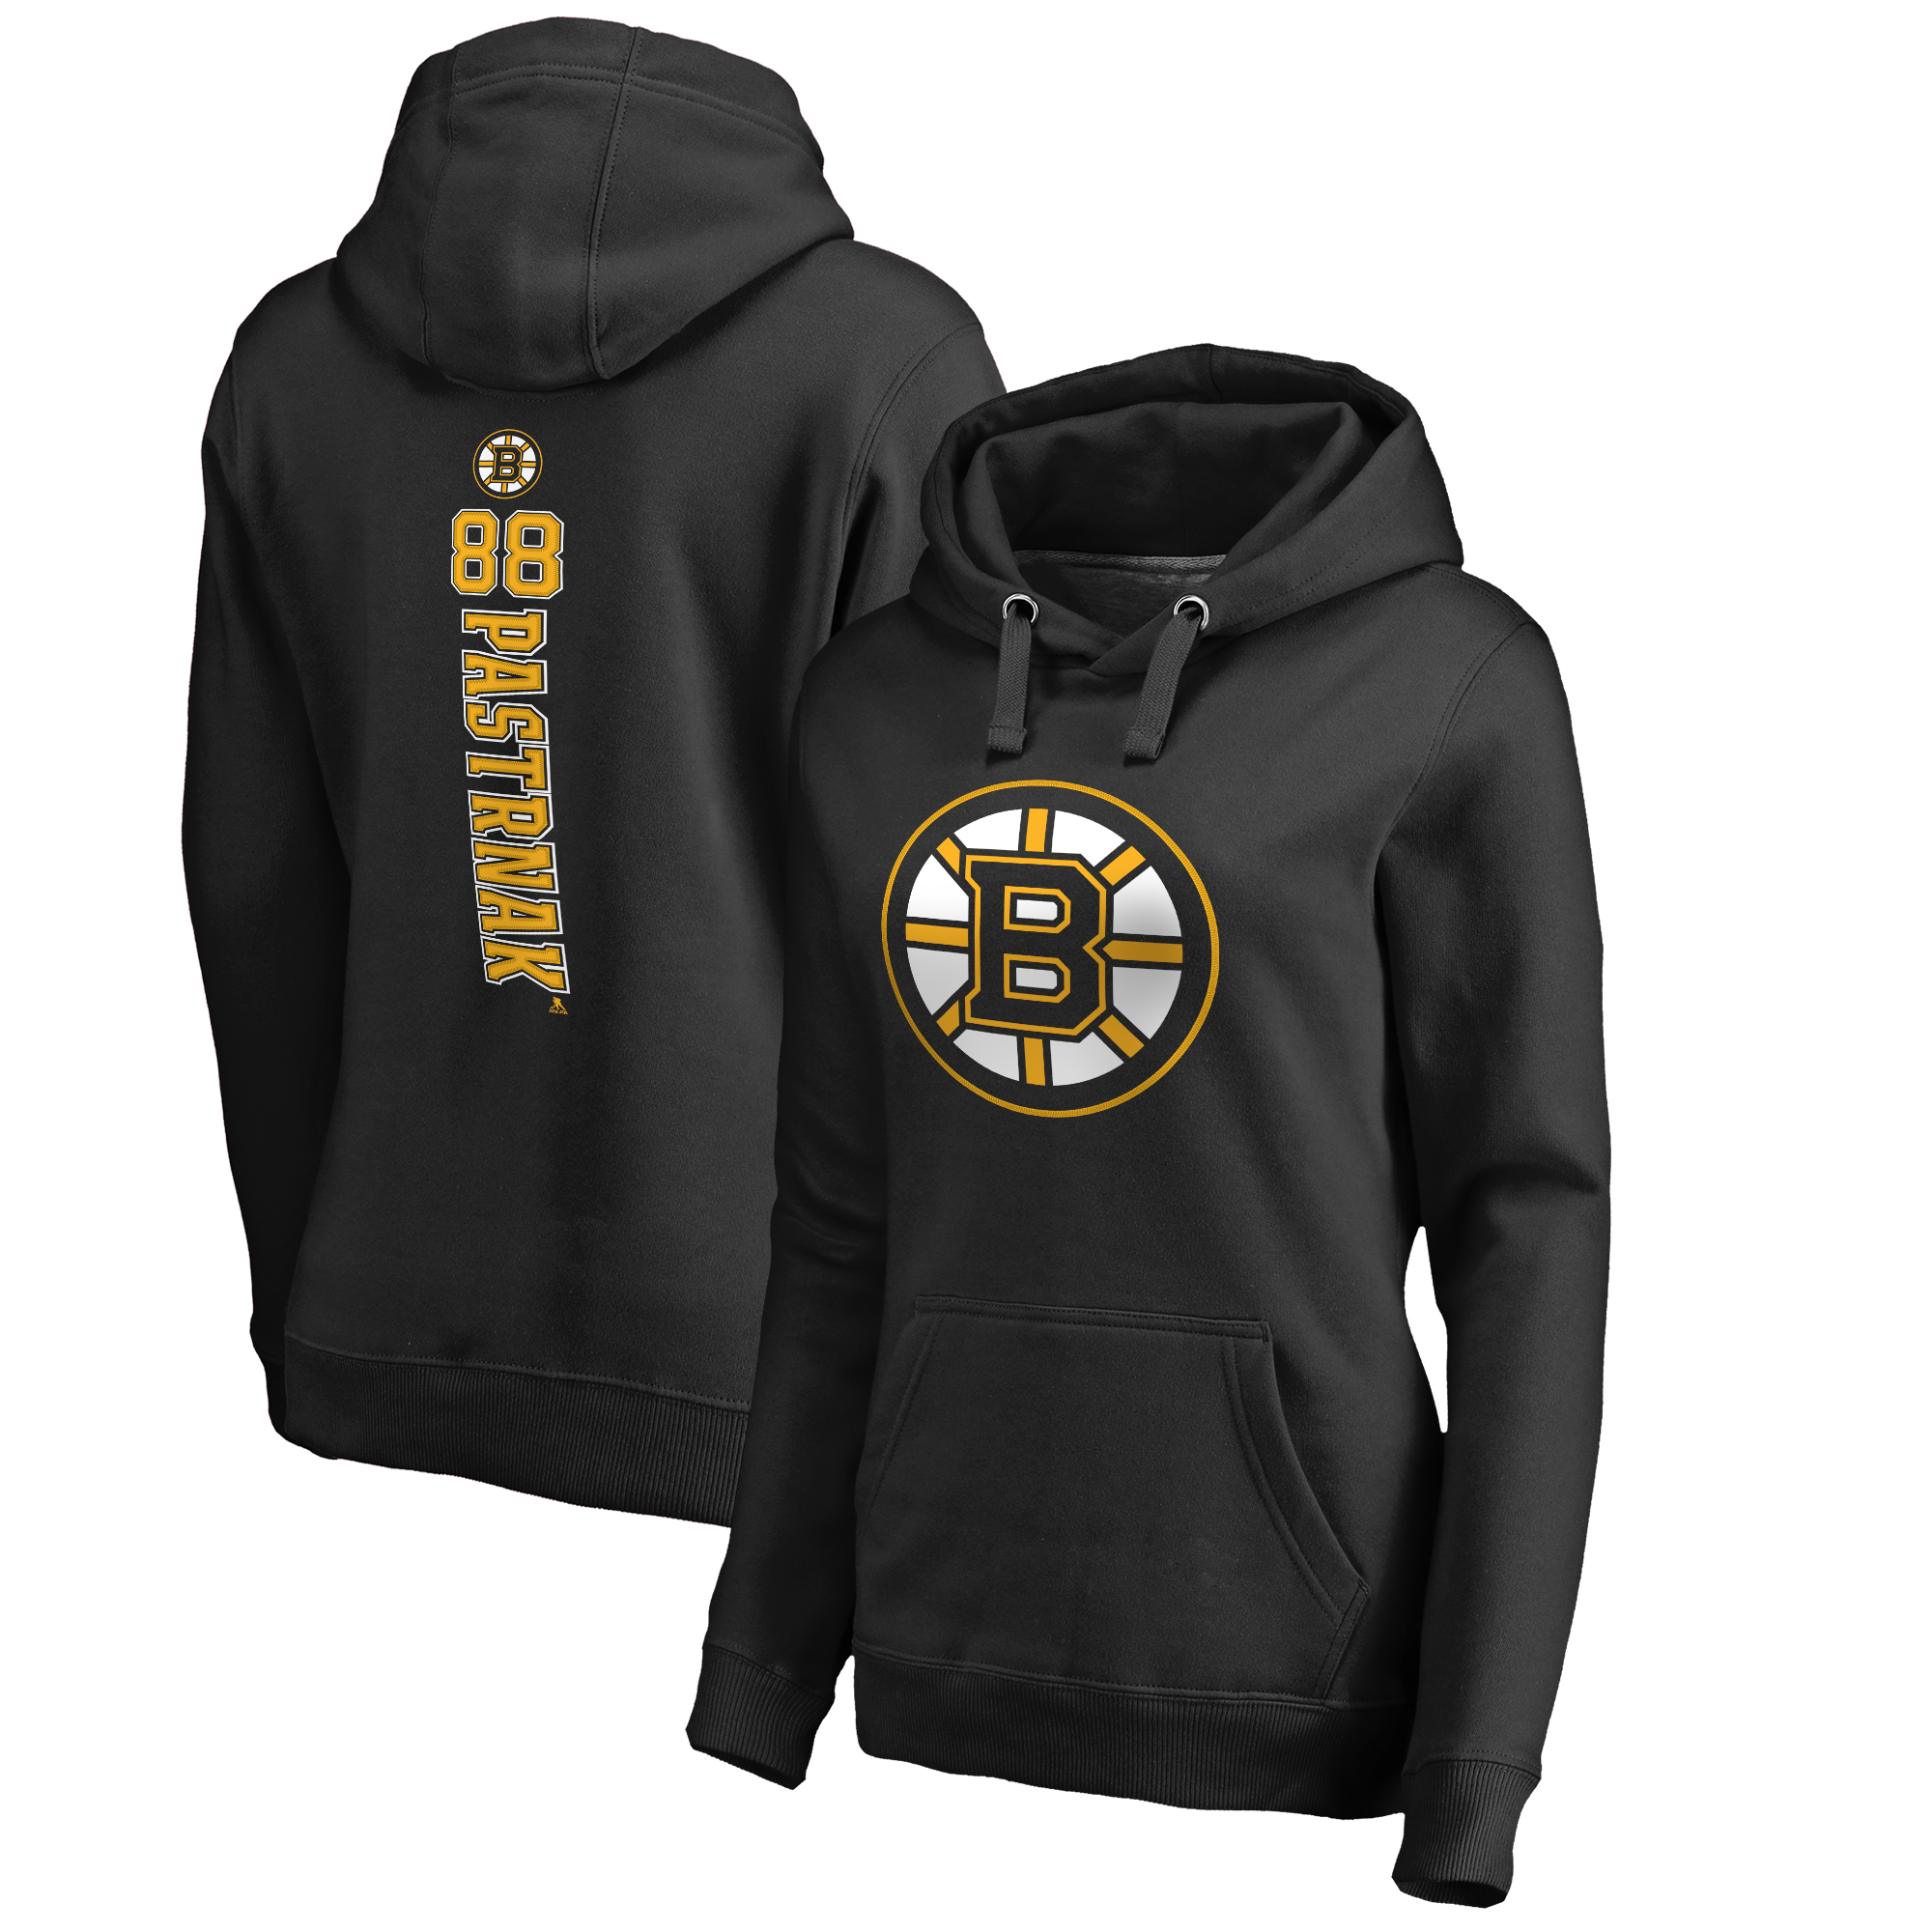 David Pastrnak Boston Bruins Fanatics Branded Women's Backer Pullover Hoodie - Black